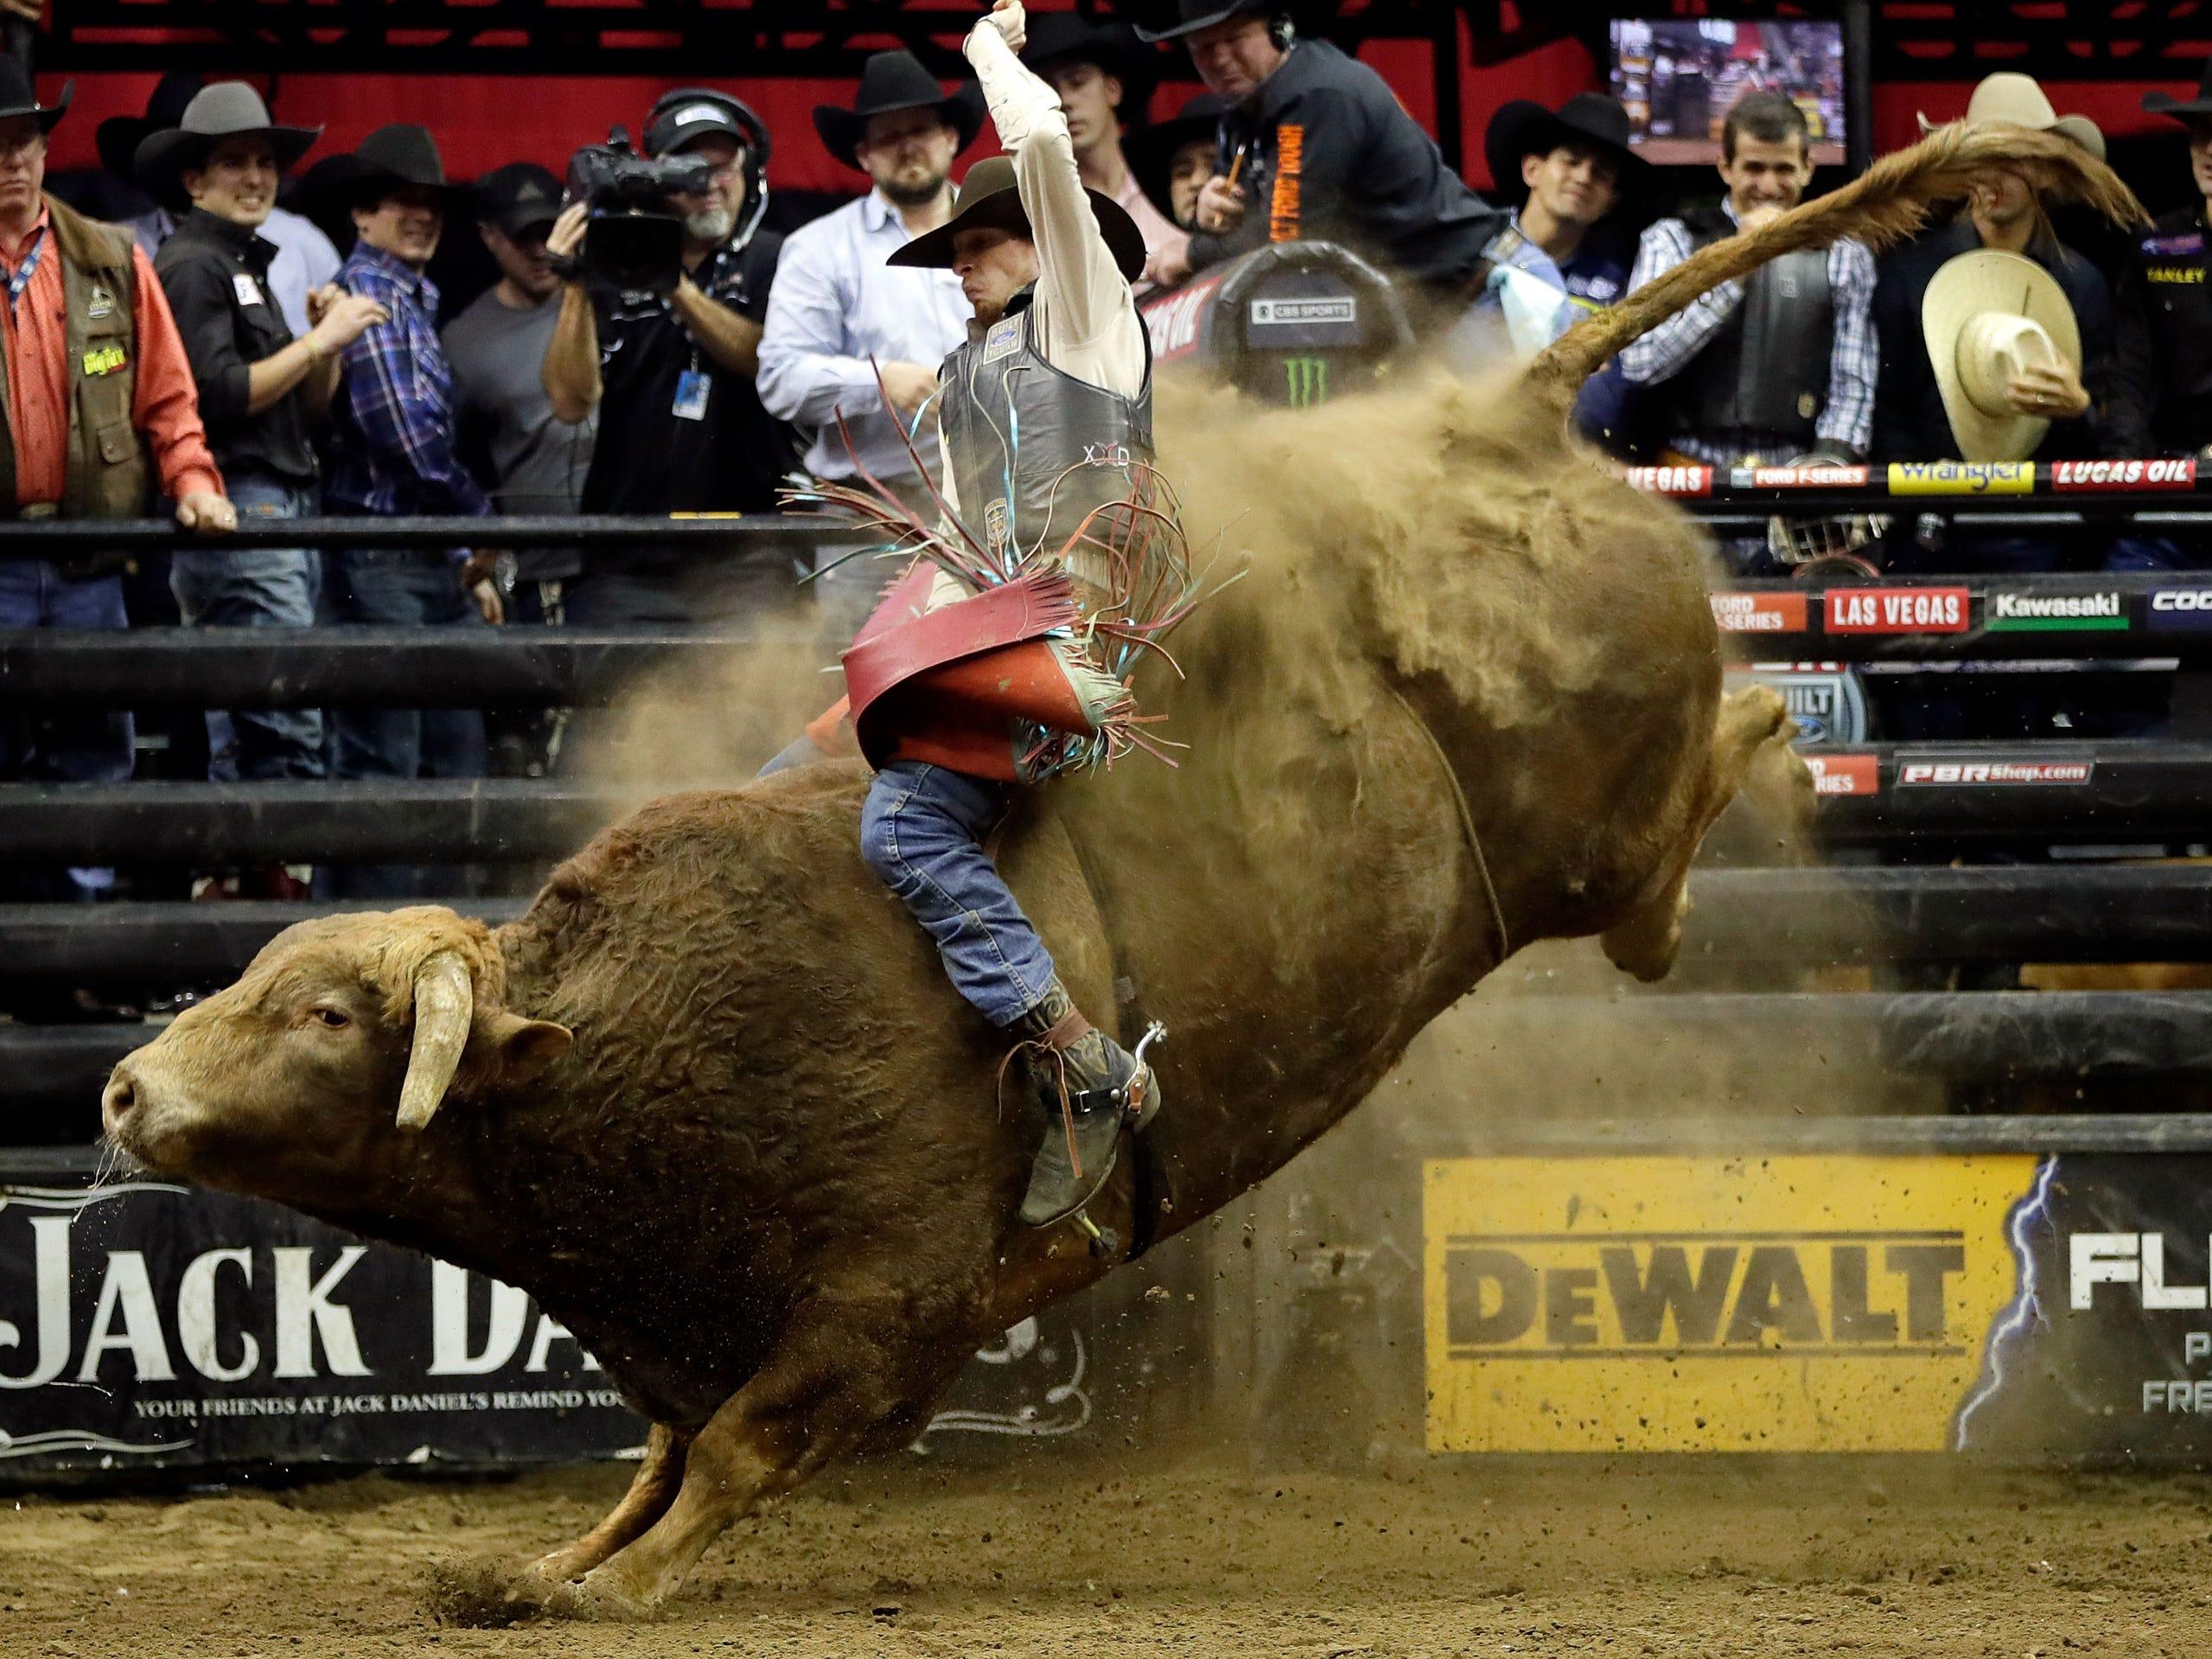 Professional bull rider Mason Lowe, 1994-2019